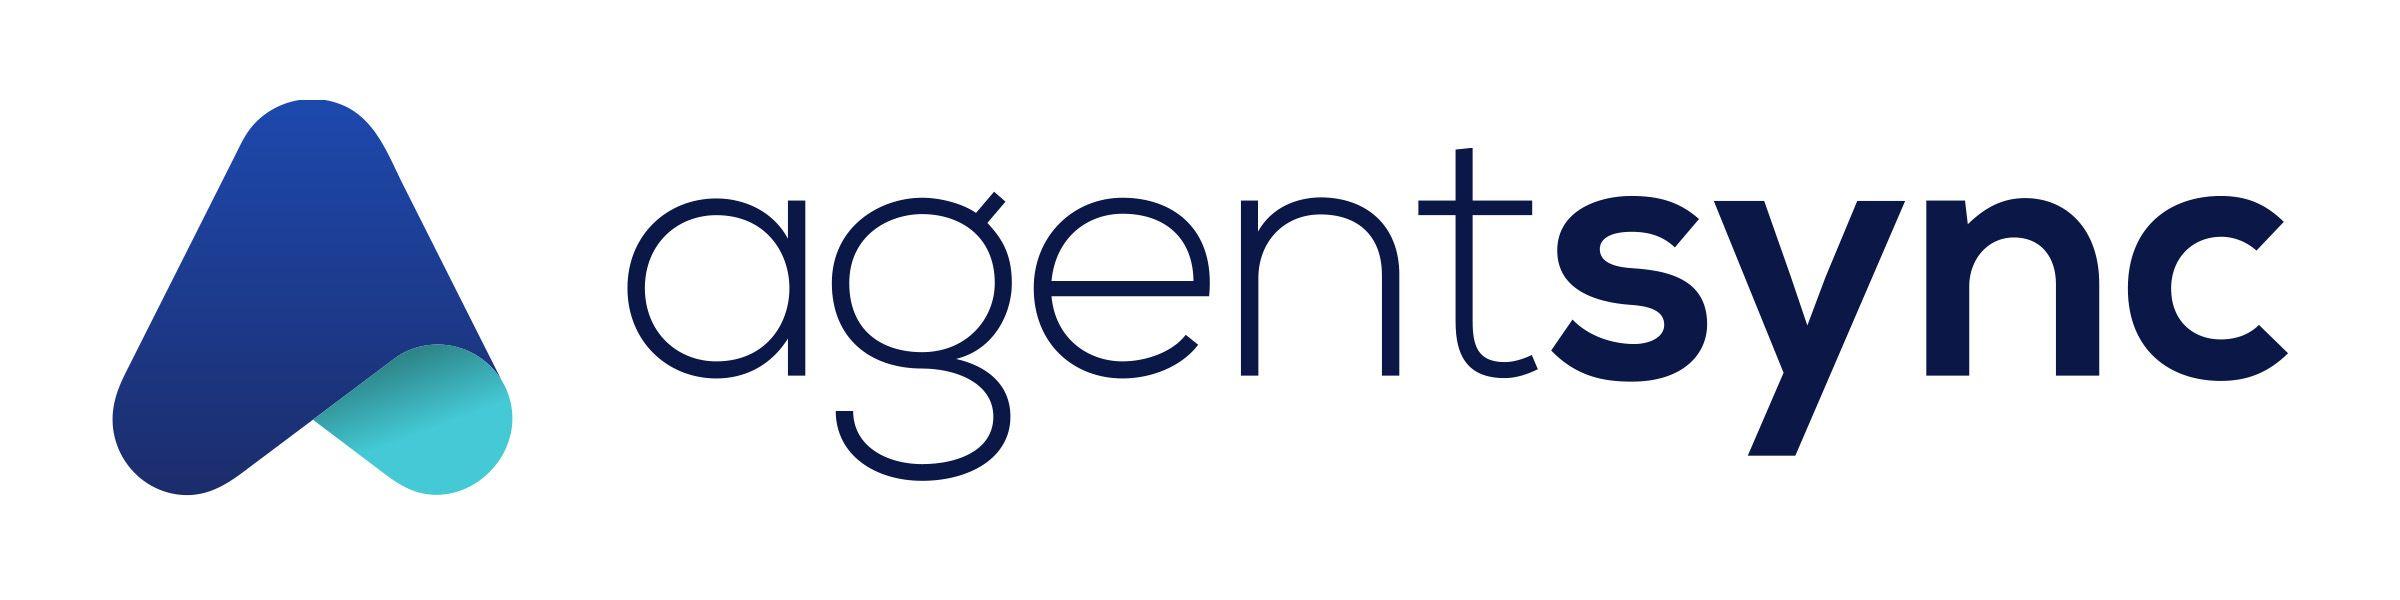 AgentSync Logo - Full Color